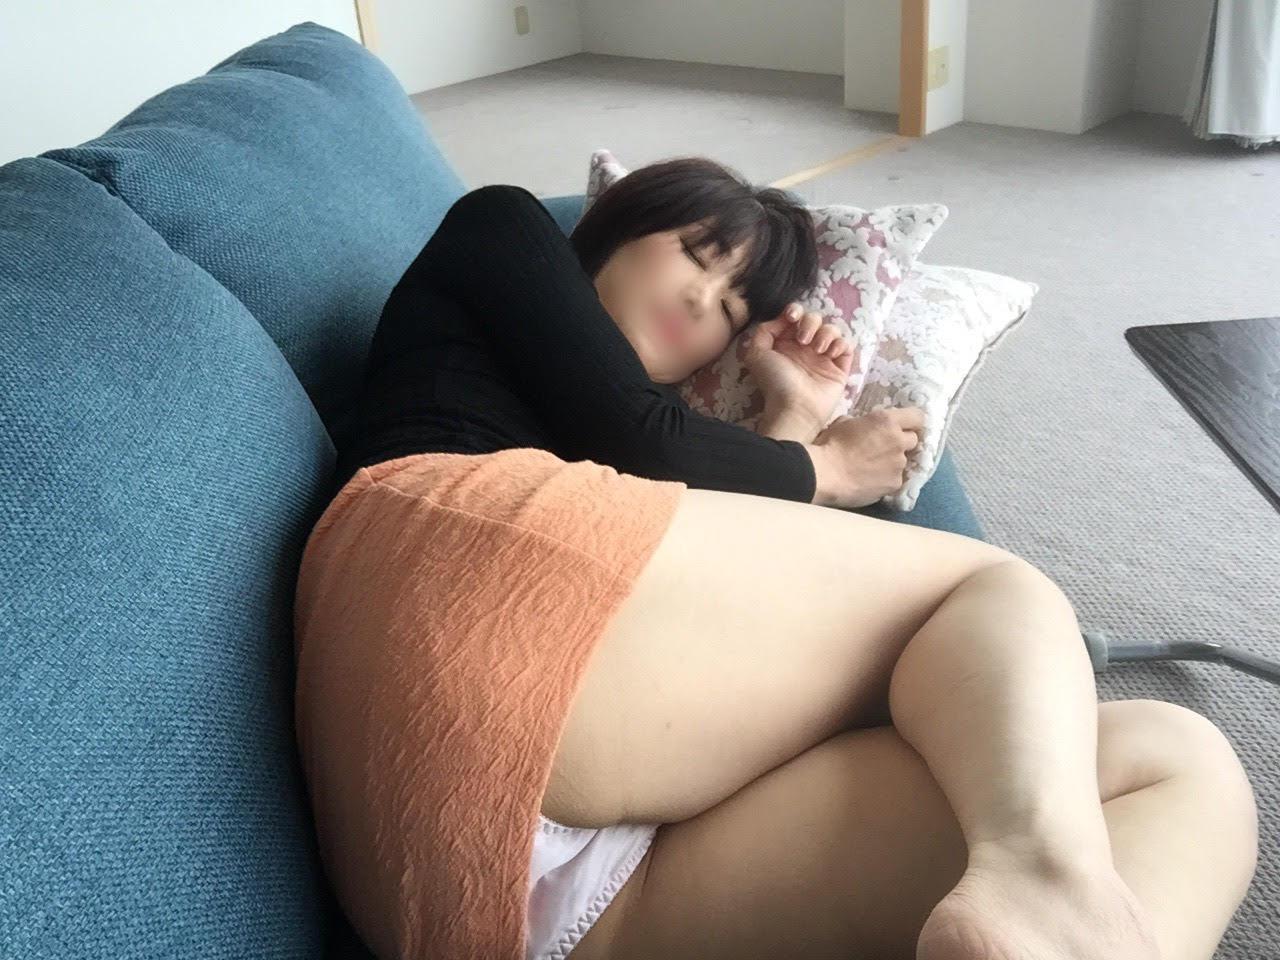 kyokocom - Japanese webcam girl